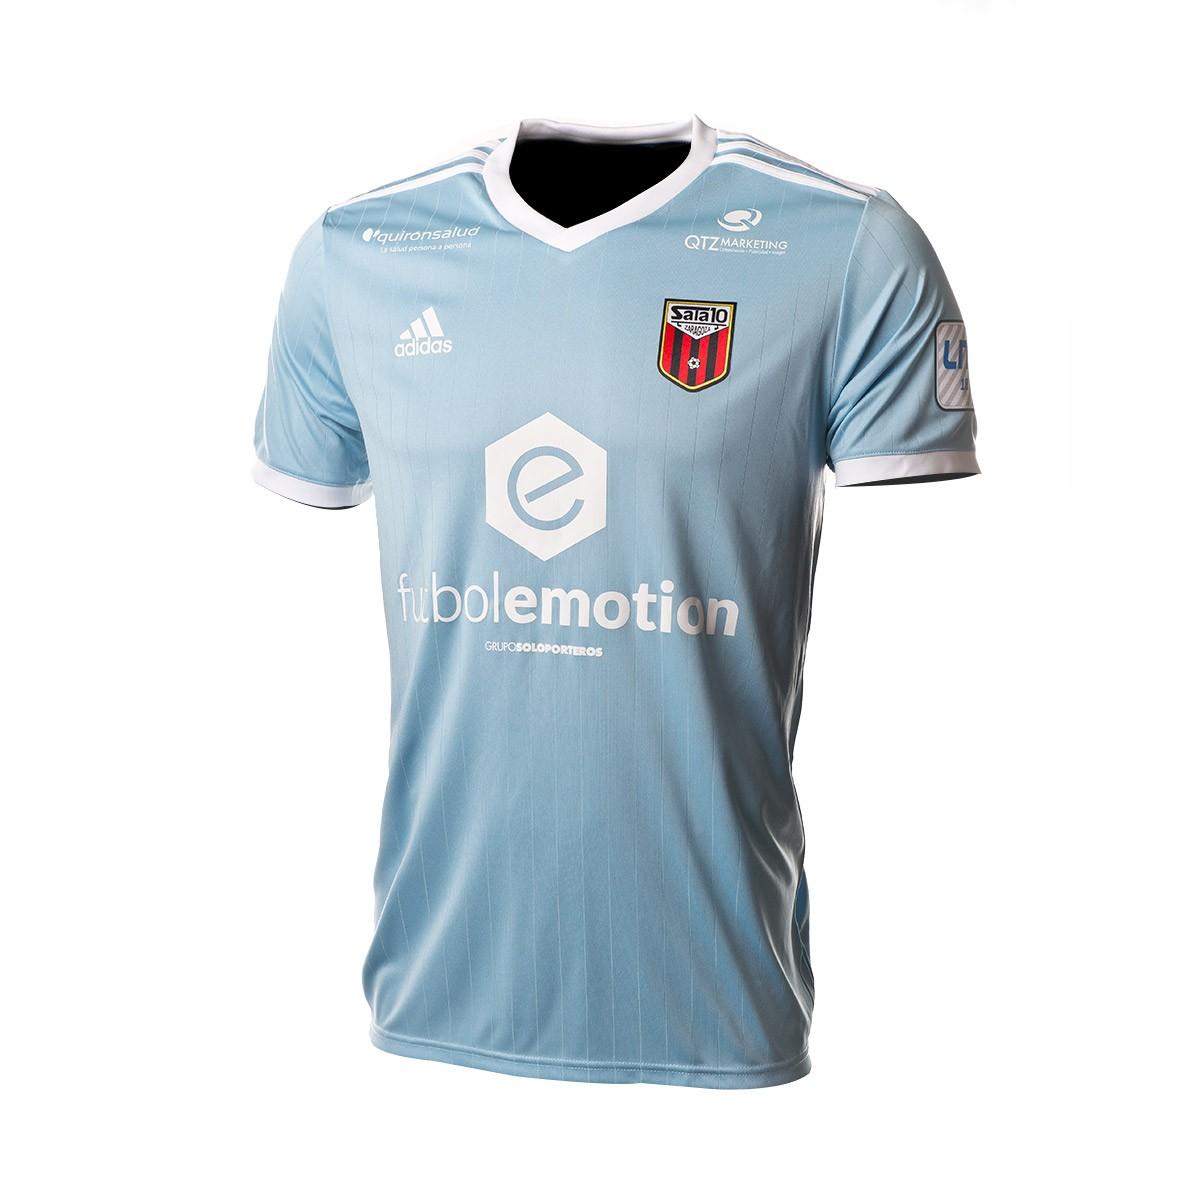 Maillot adidas Fútbol Emotion Zaragoza Gardien exterieur 1819